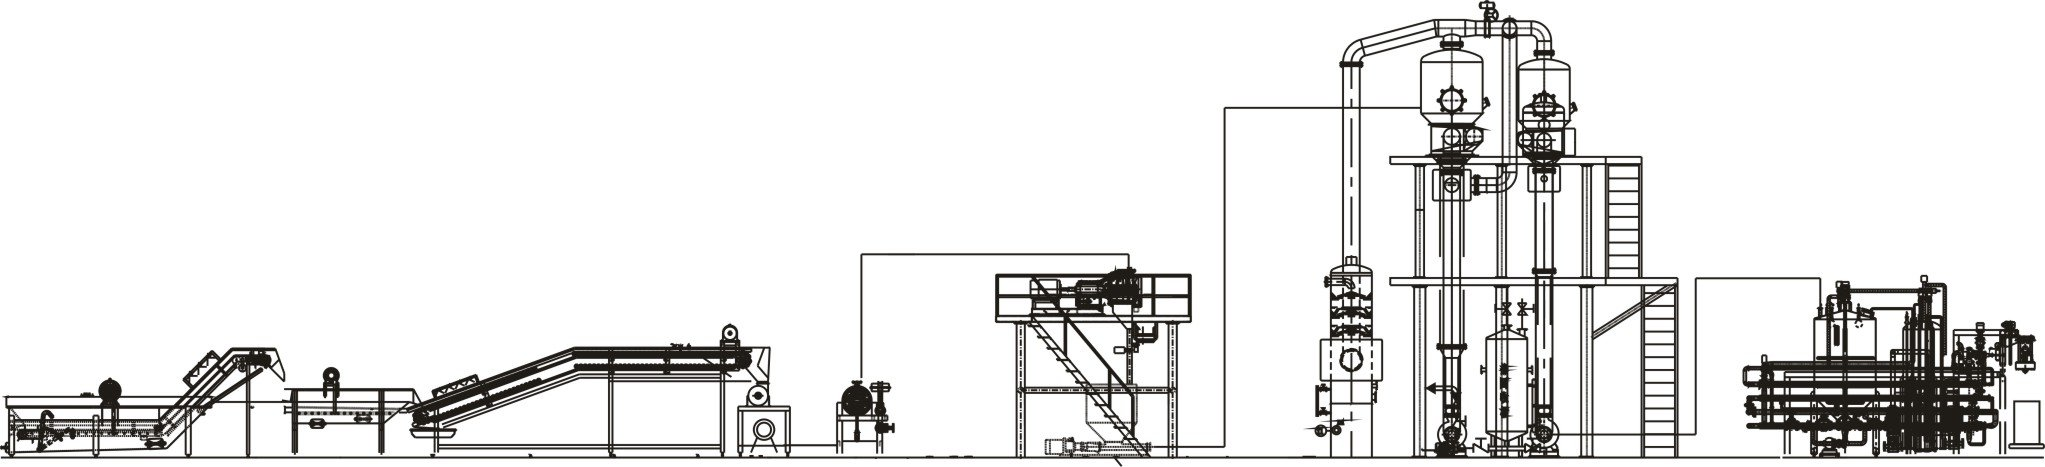 tomato processing plant layout